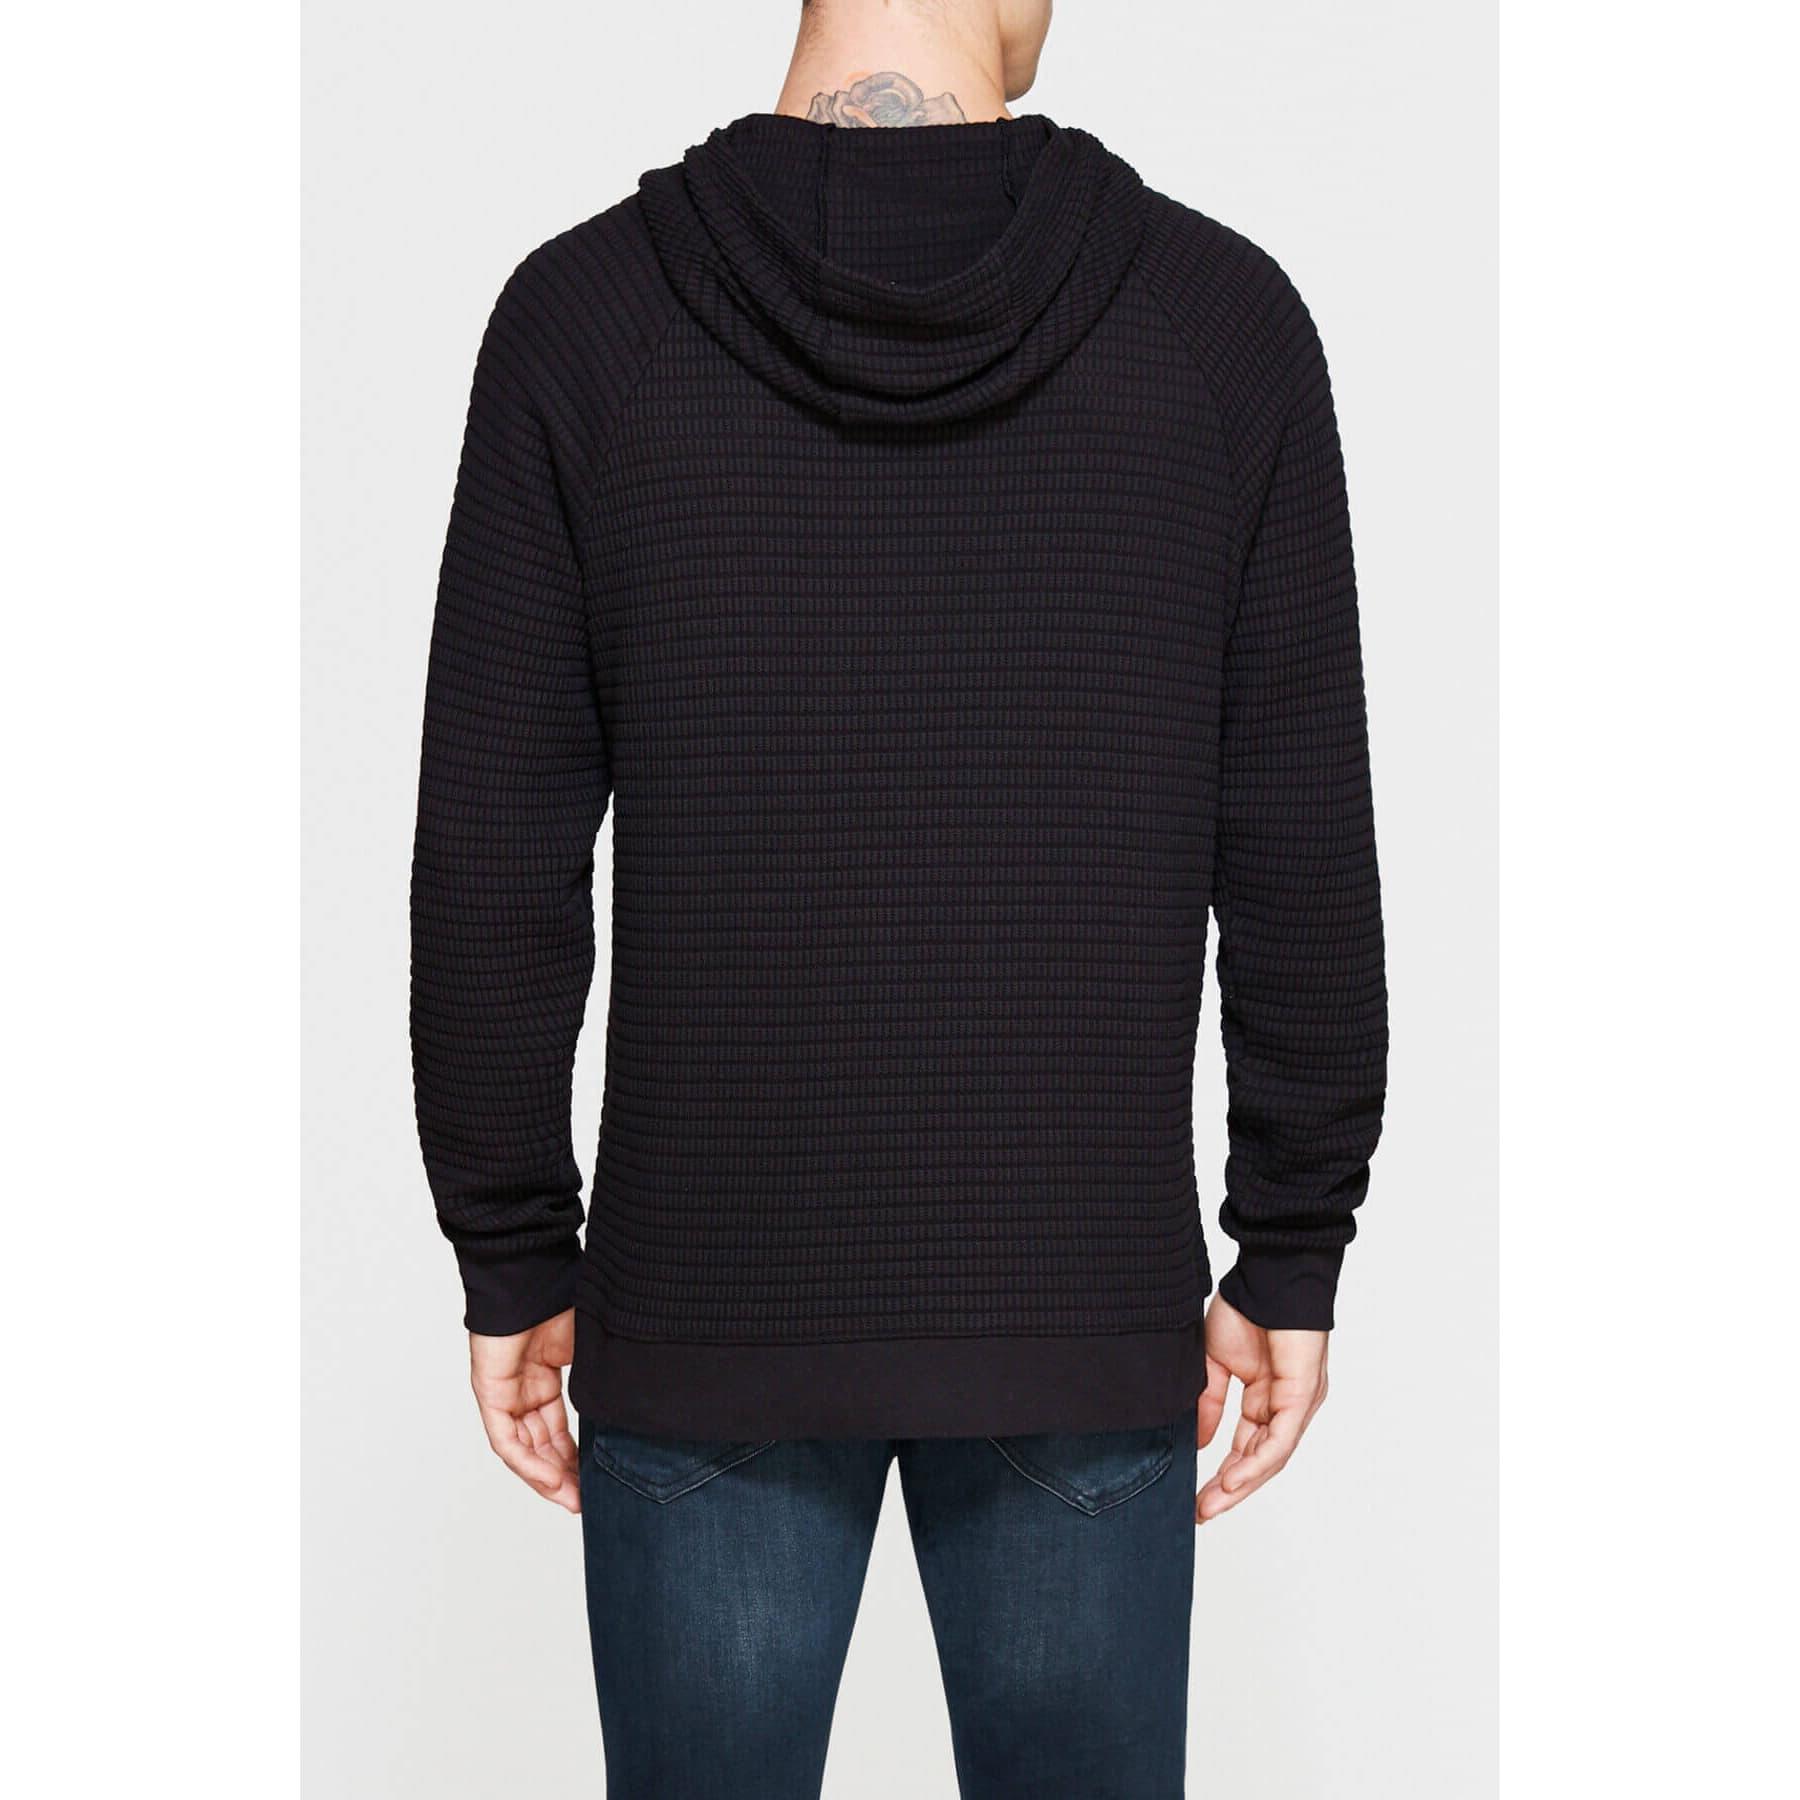 Mavi Jeans Kapüşonlu Erkek Siyah Sweatshirt